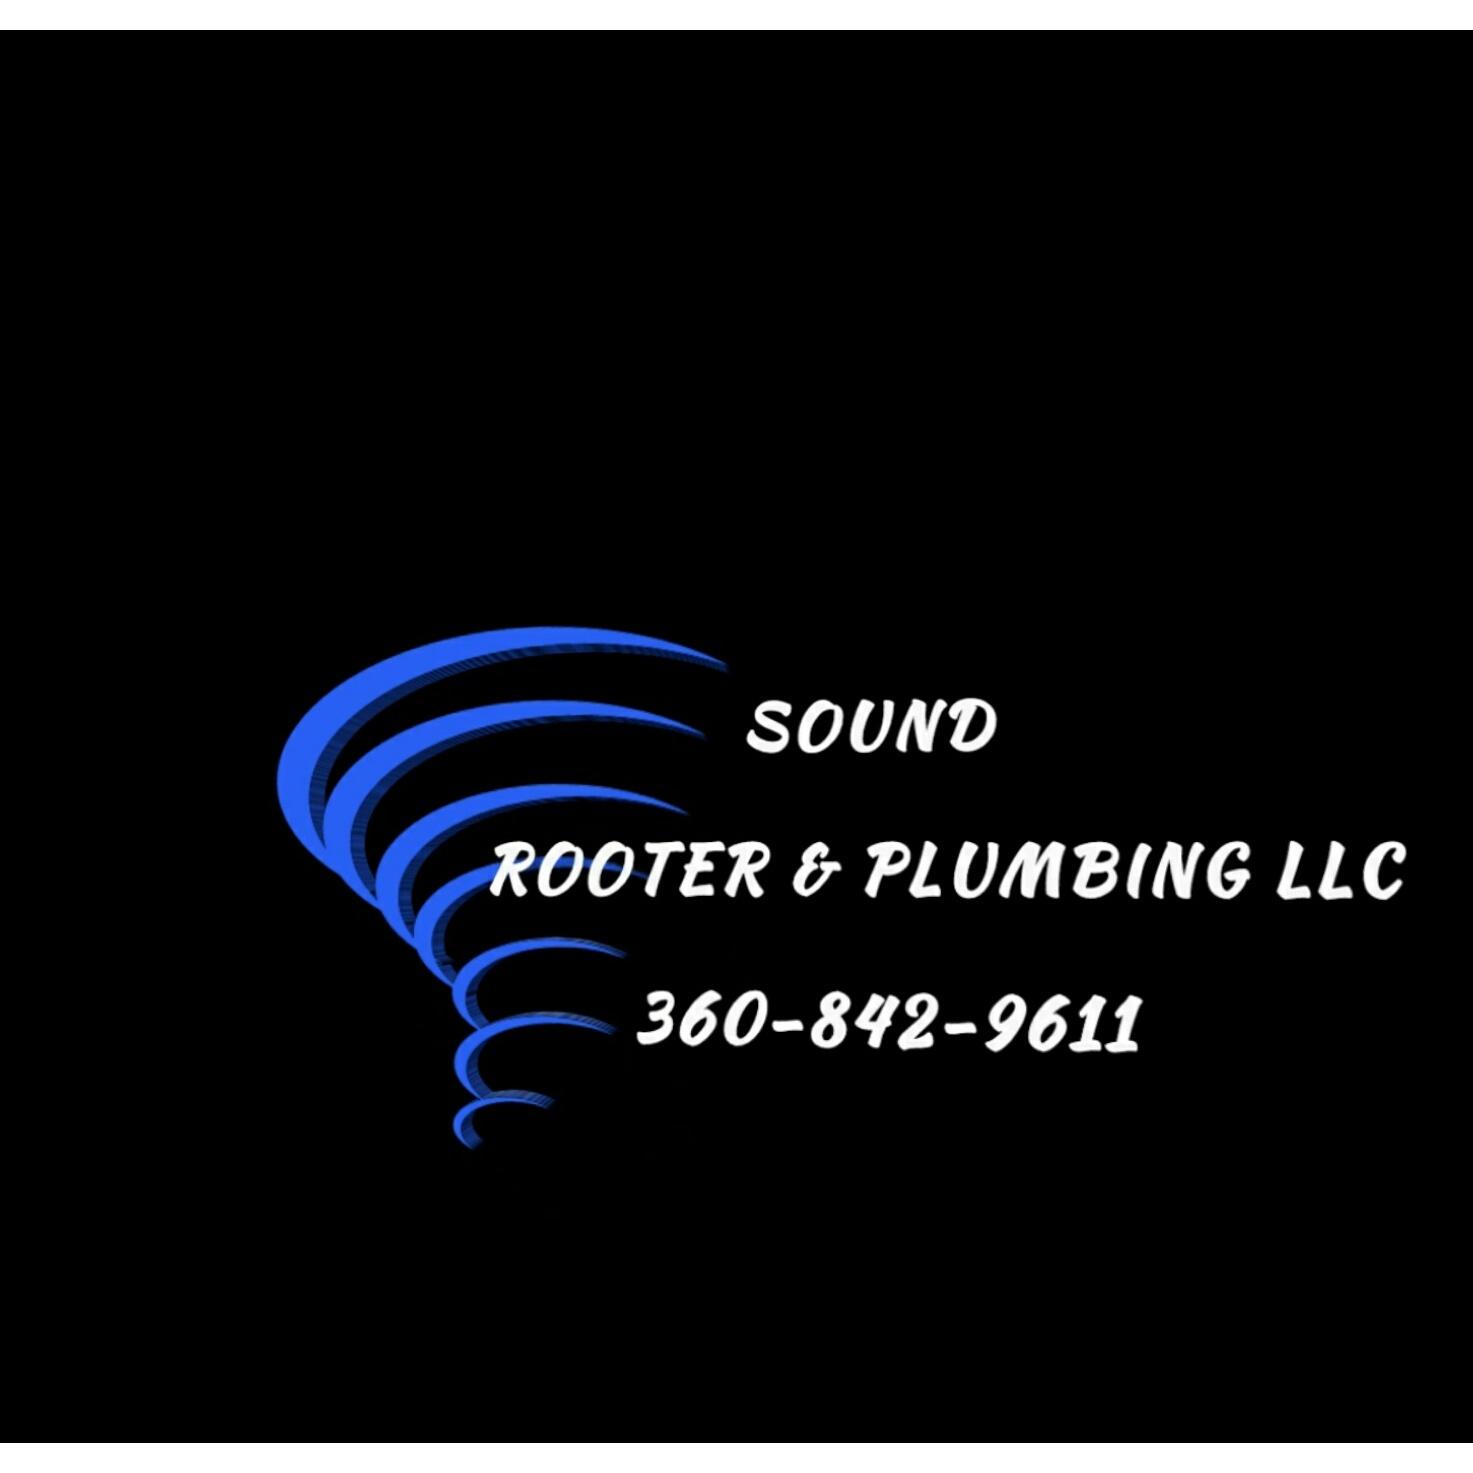 Sound Rooter & Plumbing, LLC - Lacey, WA - Plumbers & Sewer Repair